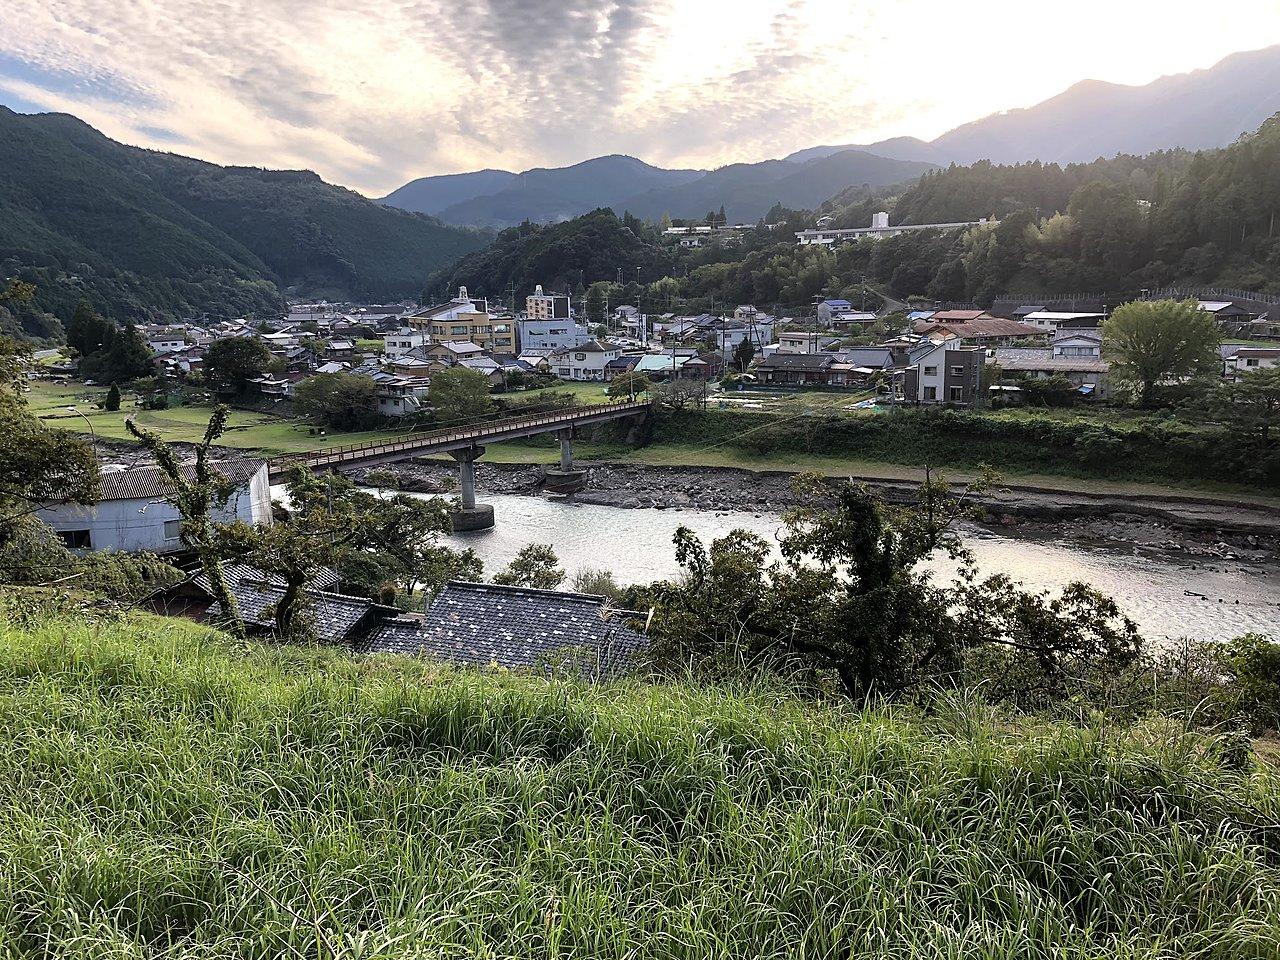 View of Kurisawaga   Photo taken by Joost S